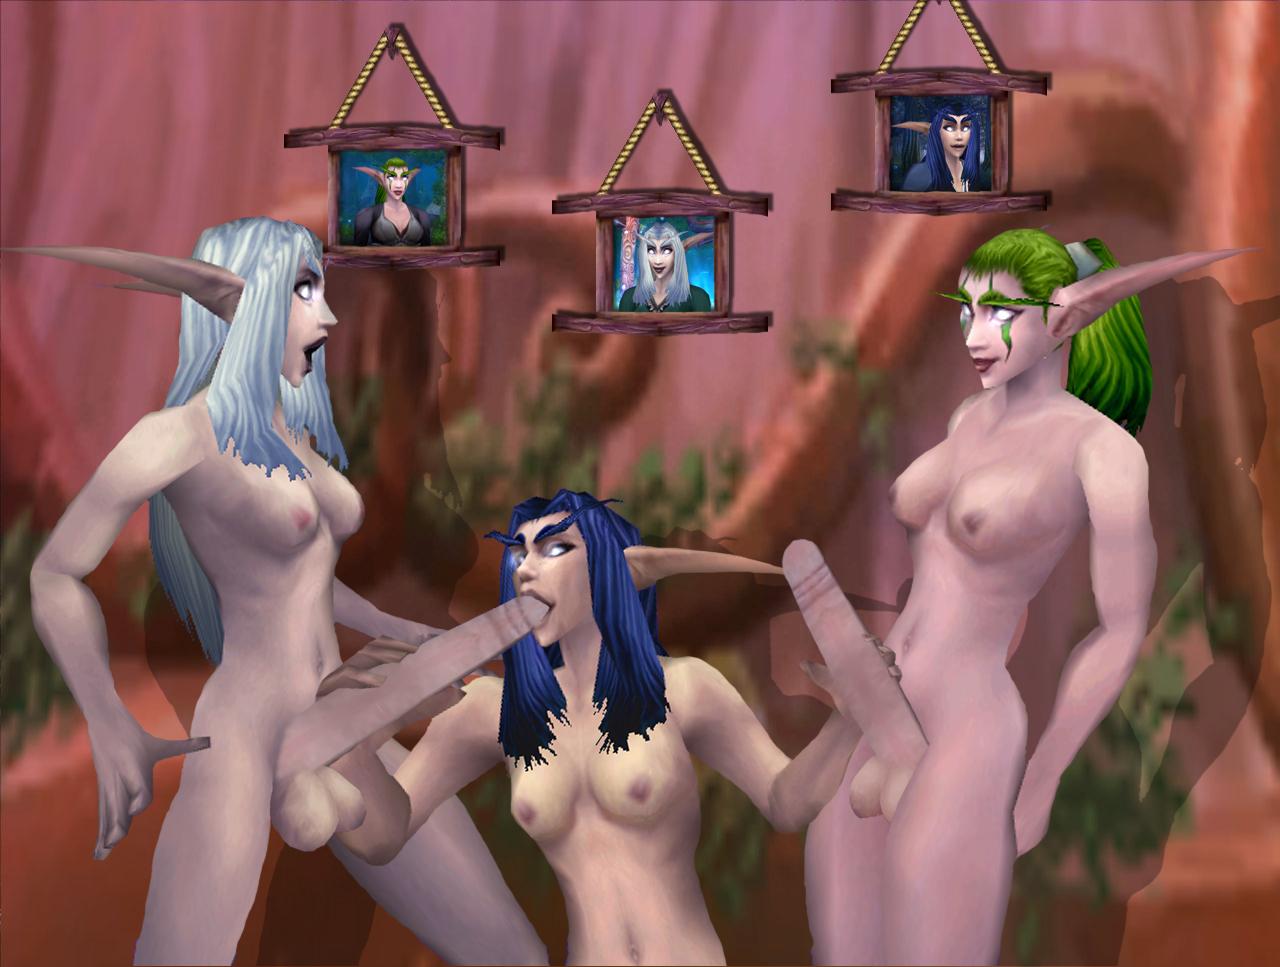 World Of Warcraft Nude Mod Compilation